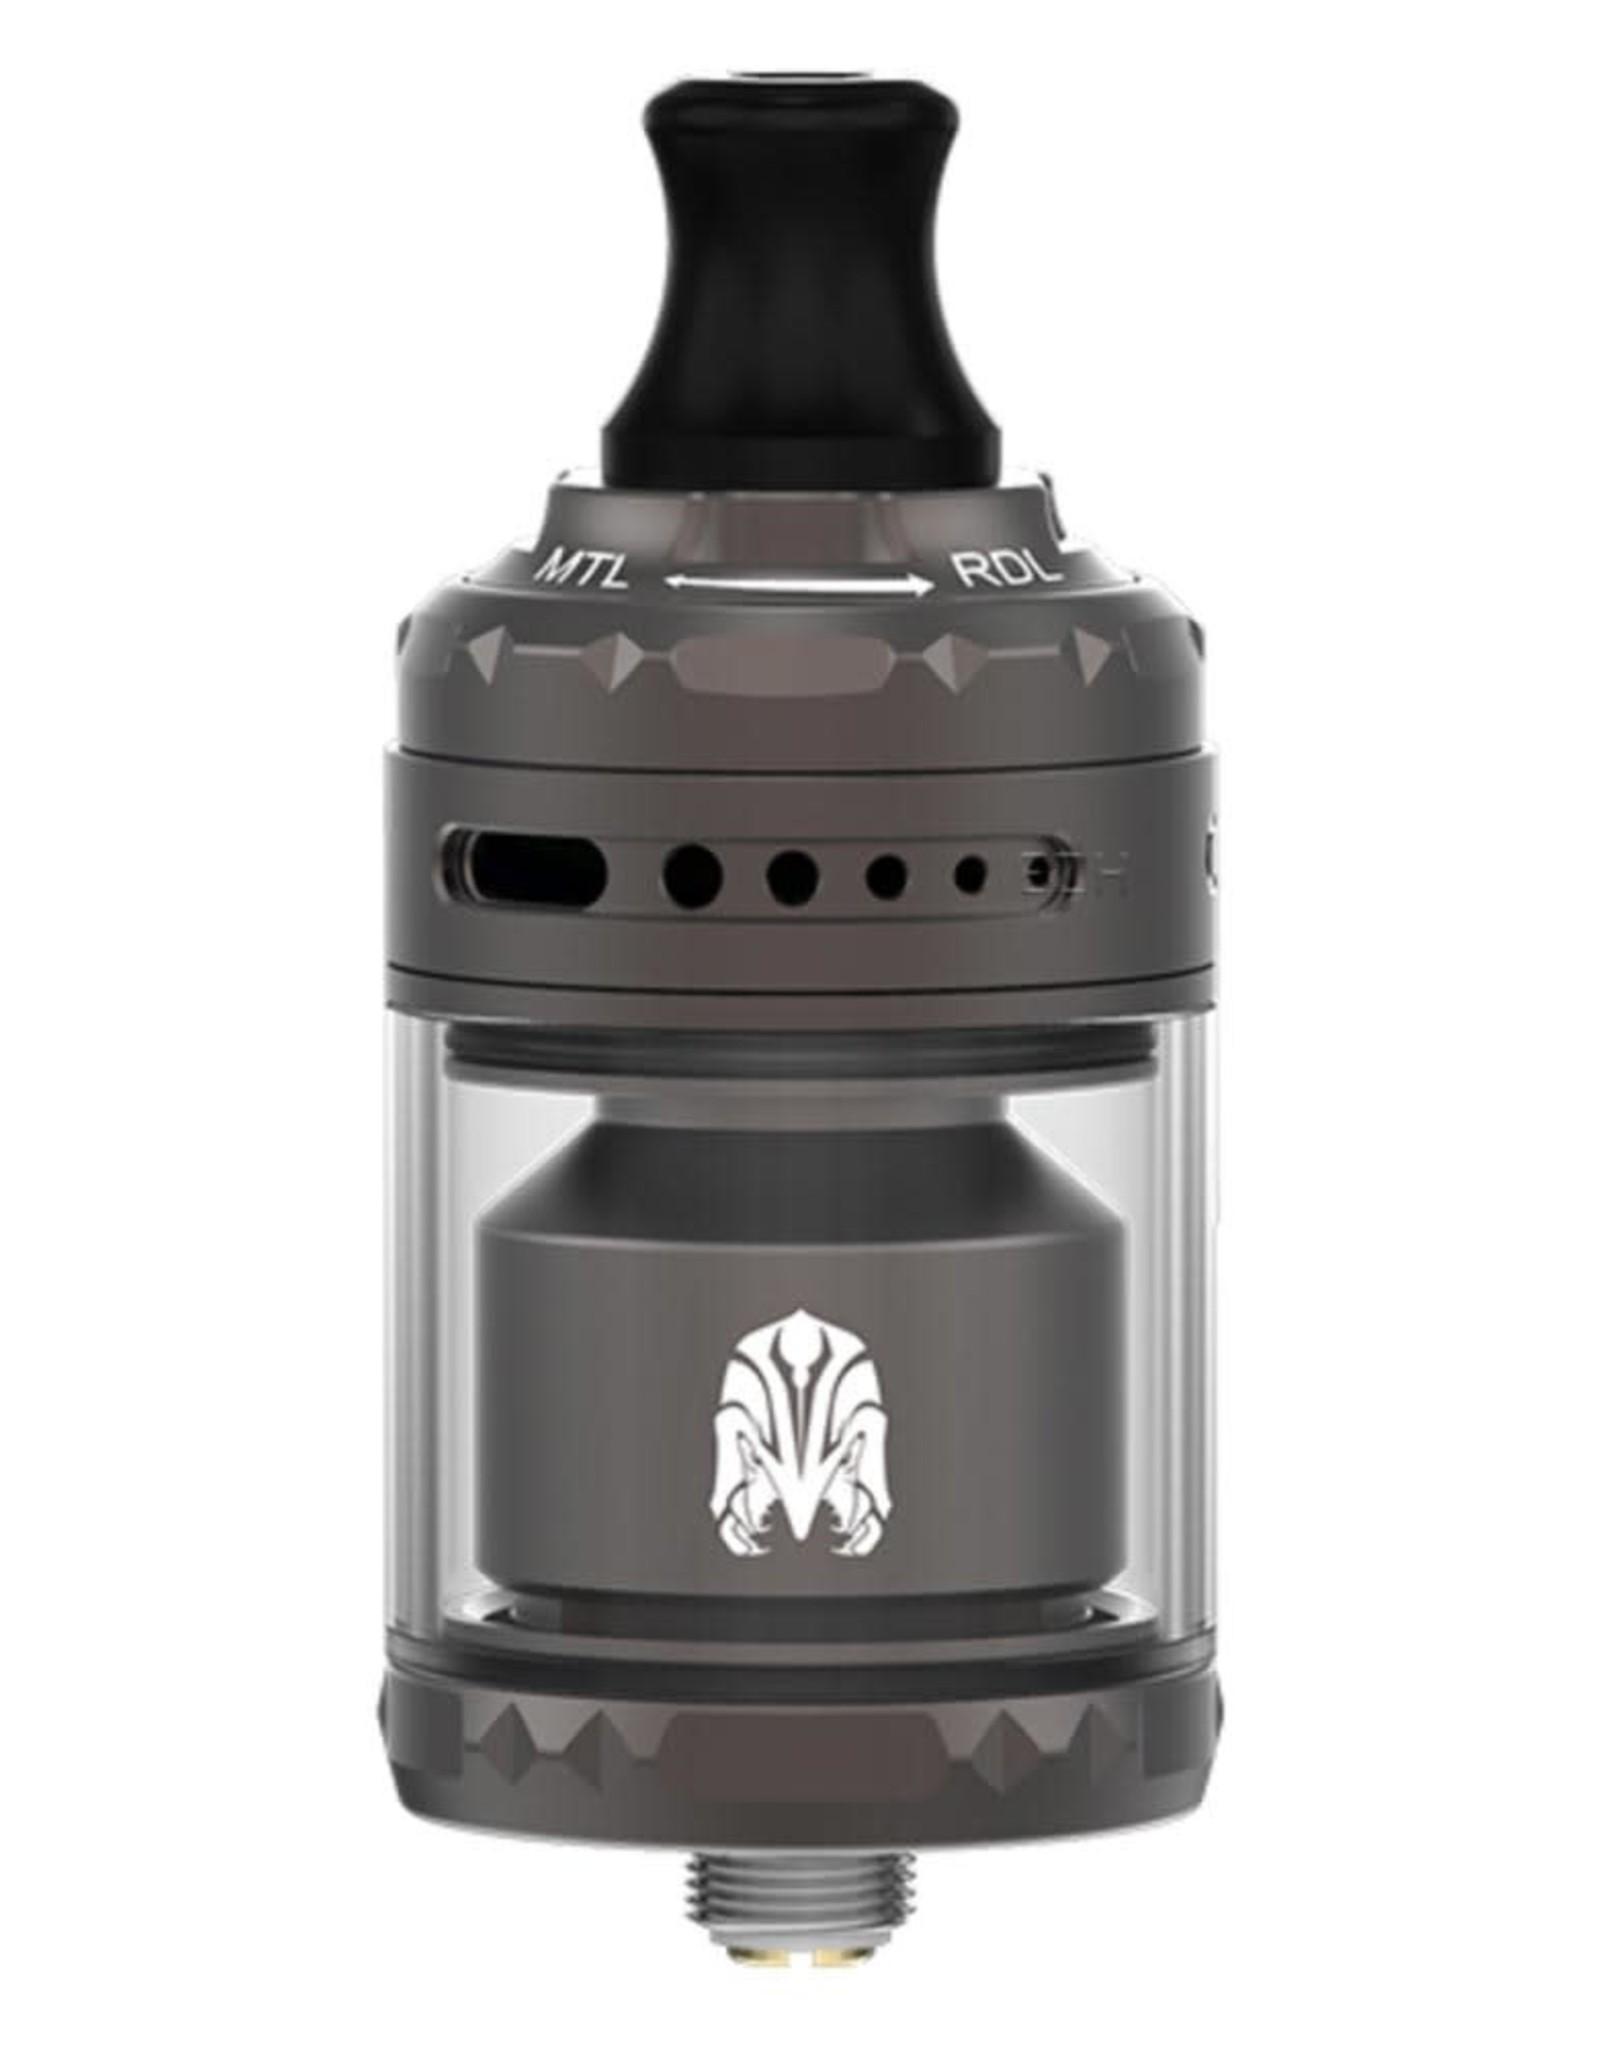 OXVA OXVA Arbiter Solo RTA